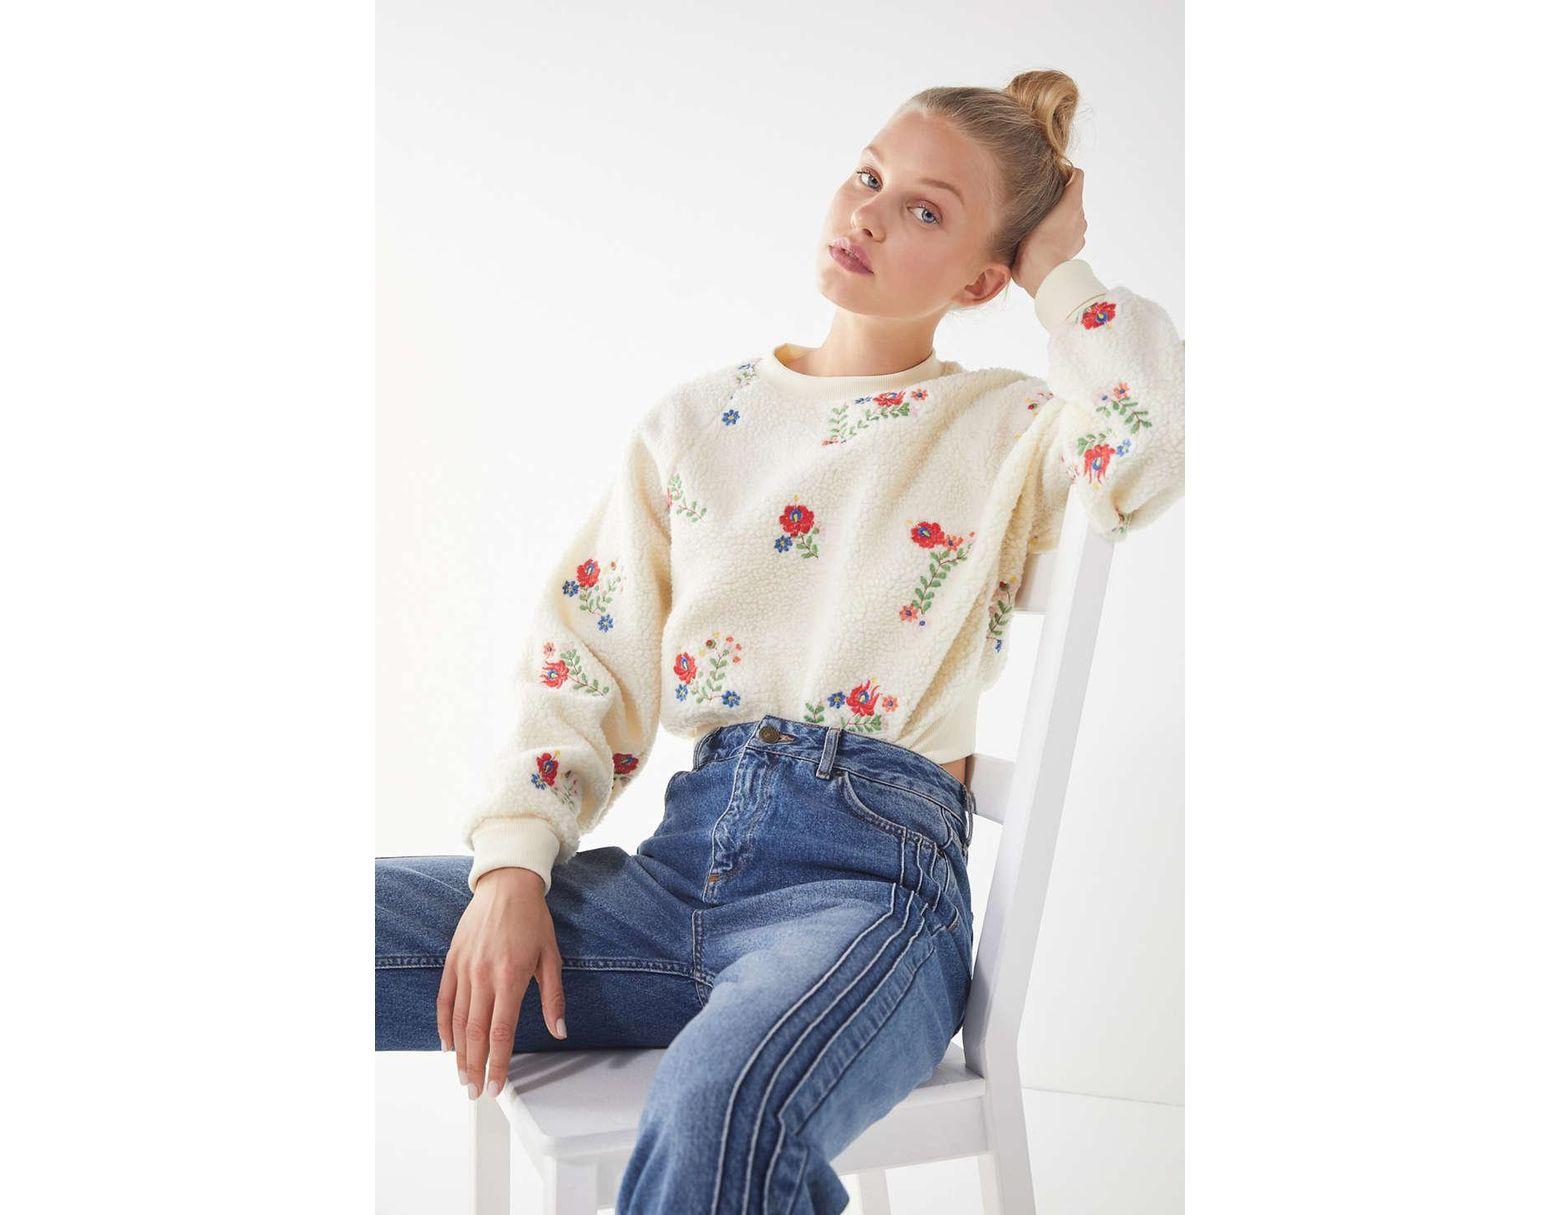 d0052790de6 Urban Outfitters. Women's Uo Aster Floral Sherpa Cropped Sweatshirt